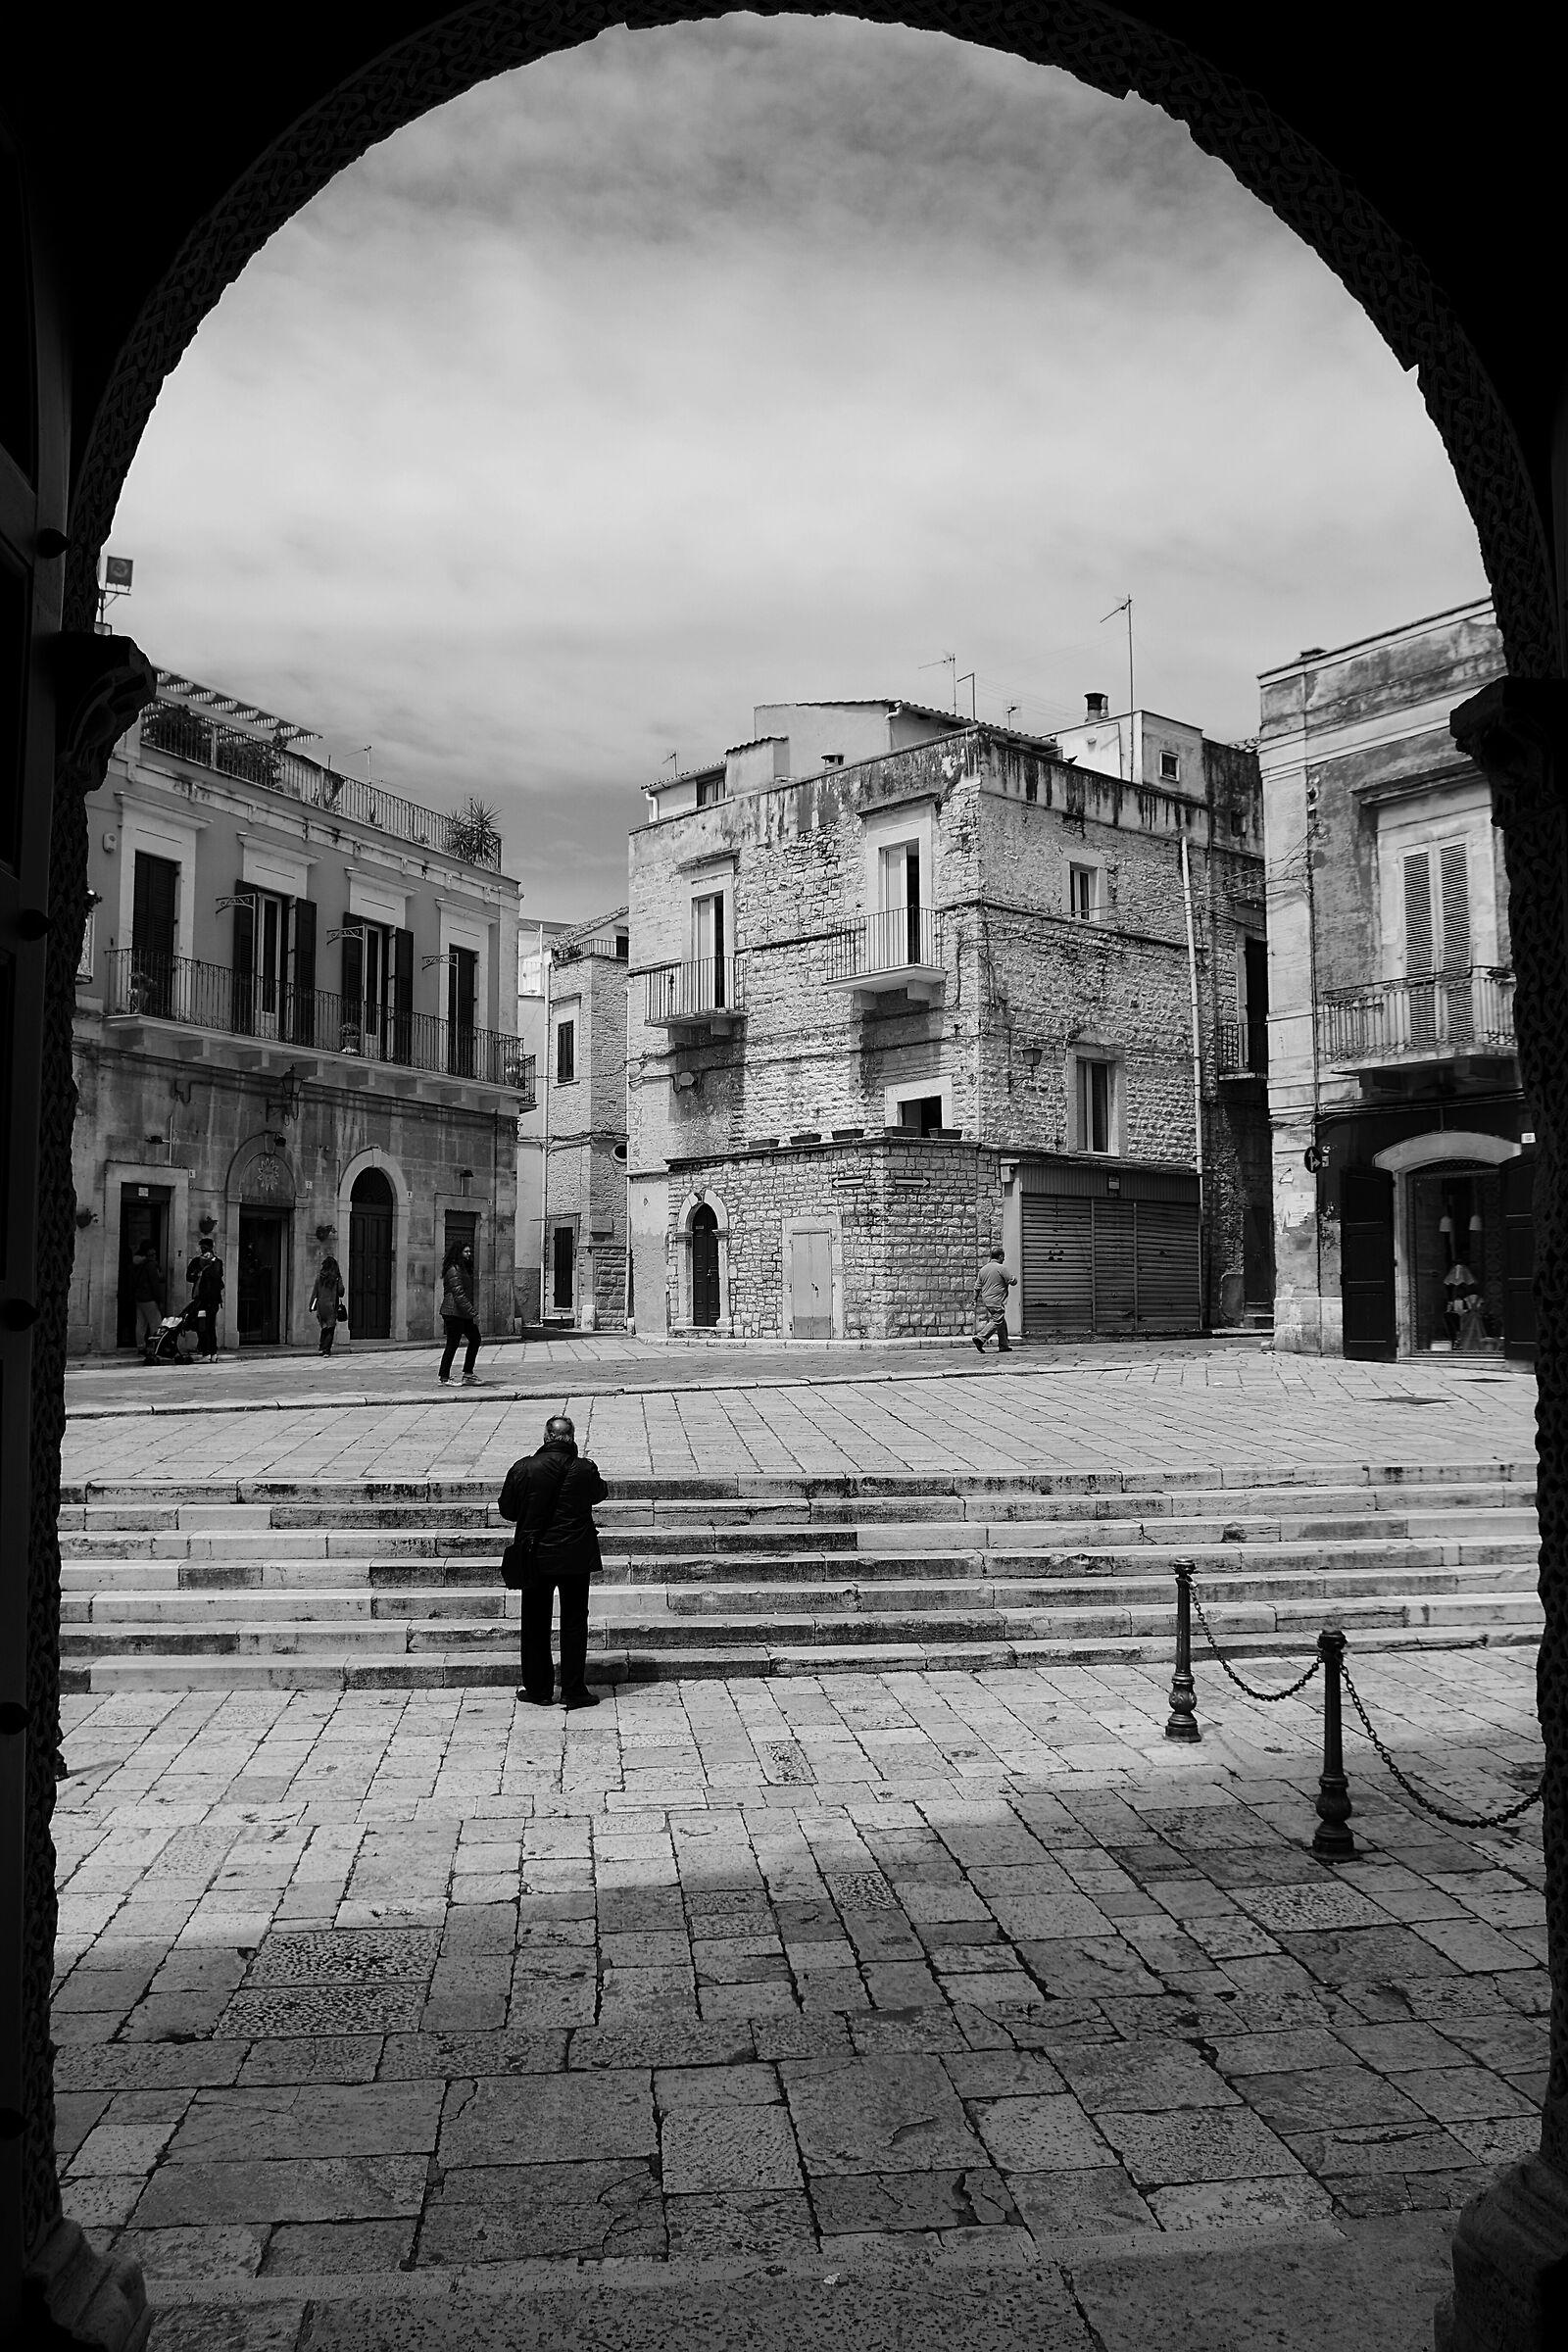 Somewhere in Puglia ...